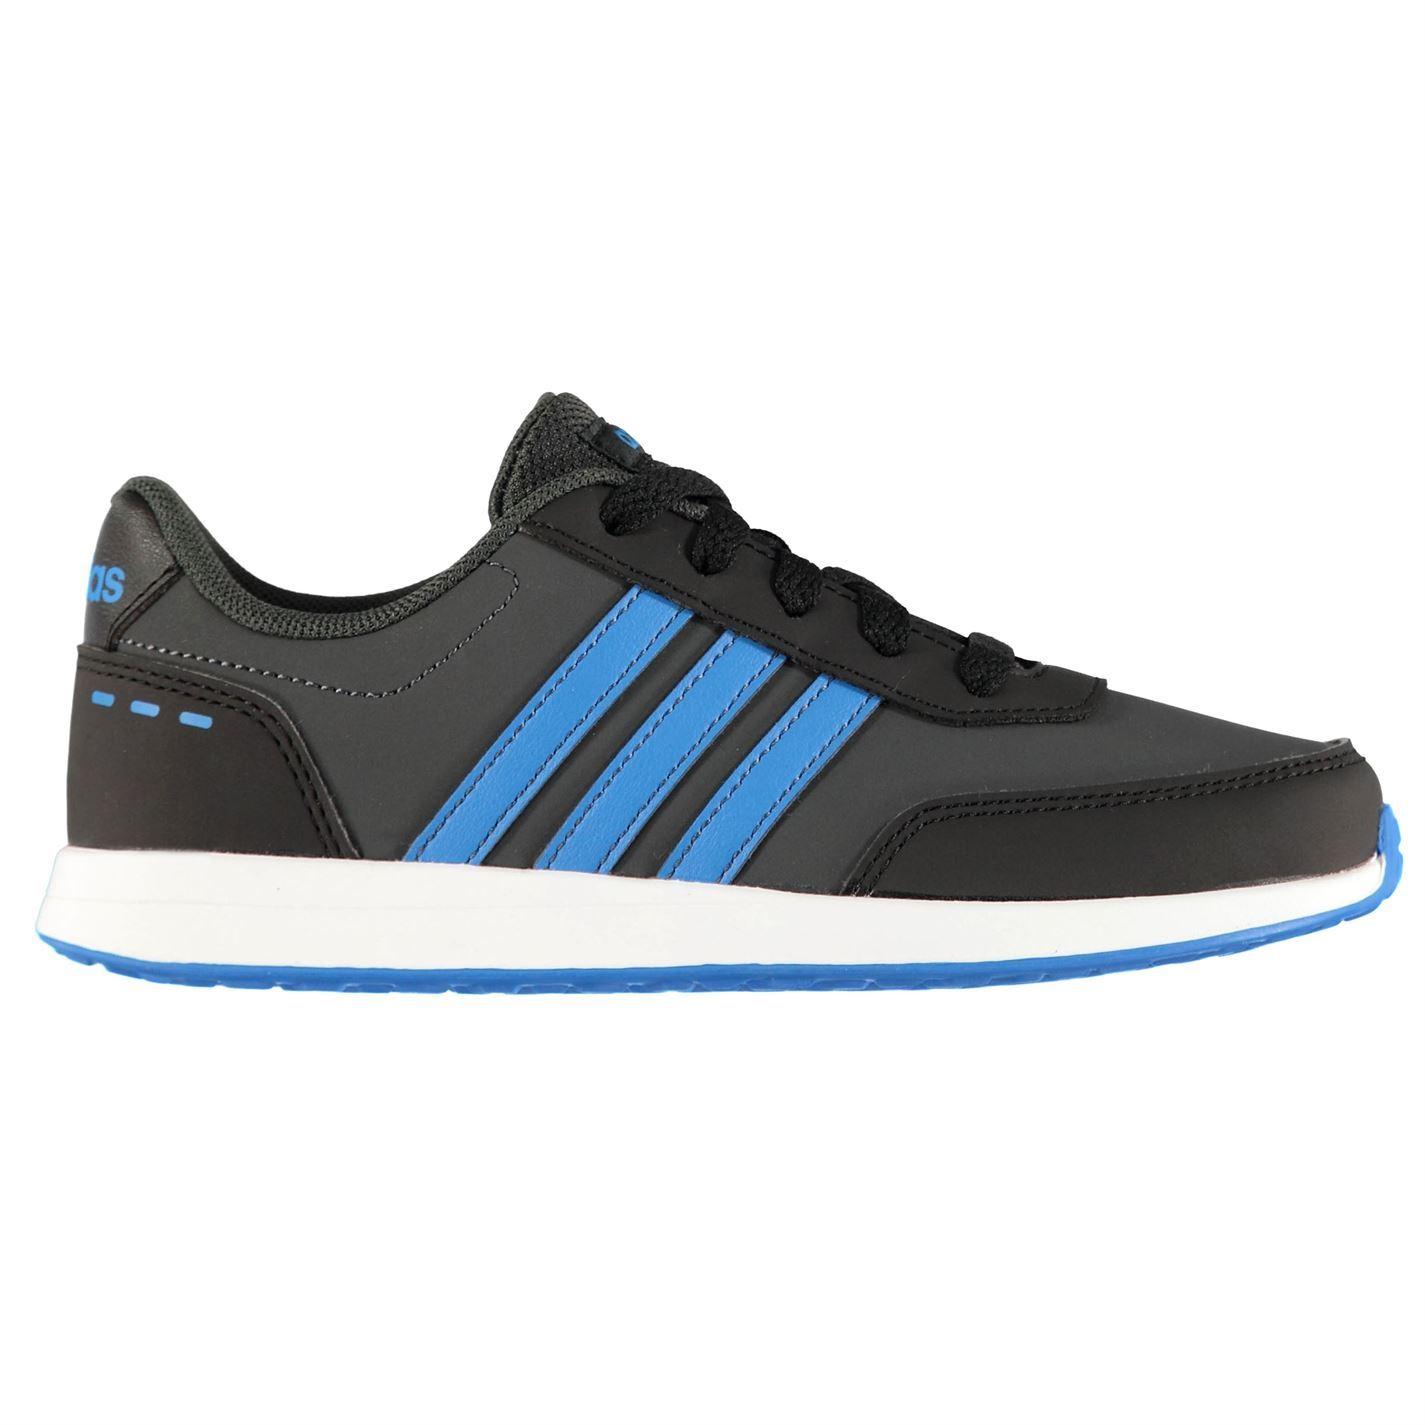 miniatura 11 - ADIDAS-Switch-Nubuck-Scarpe-da-ginnastica-bambino-ragazzo-calzature